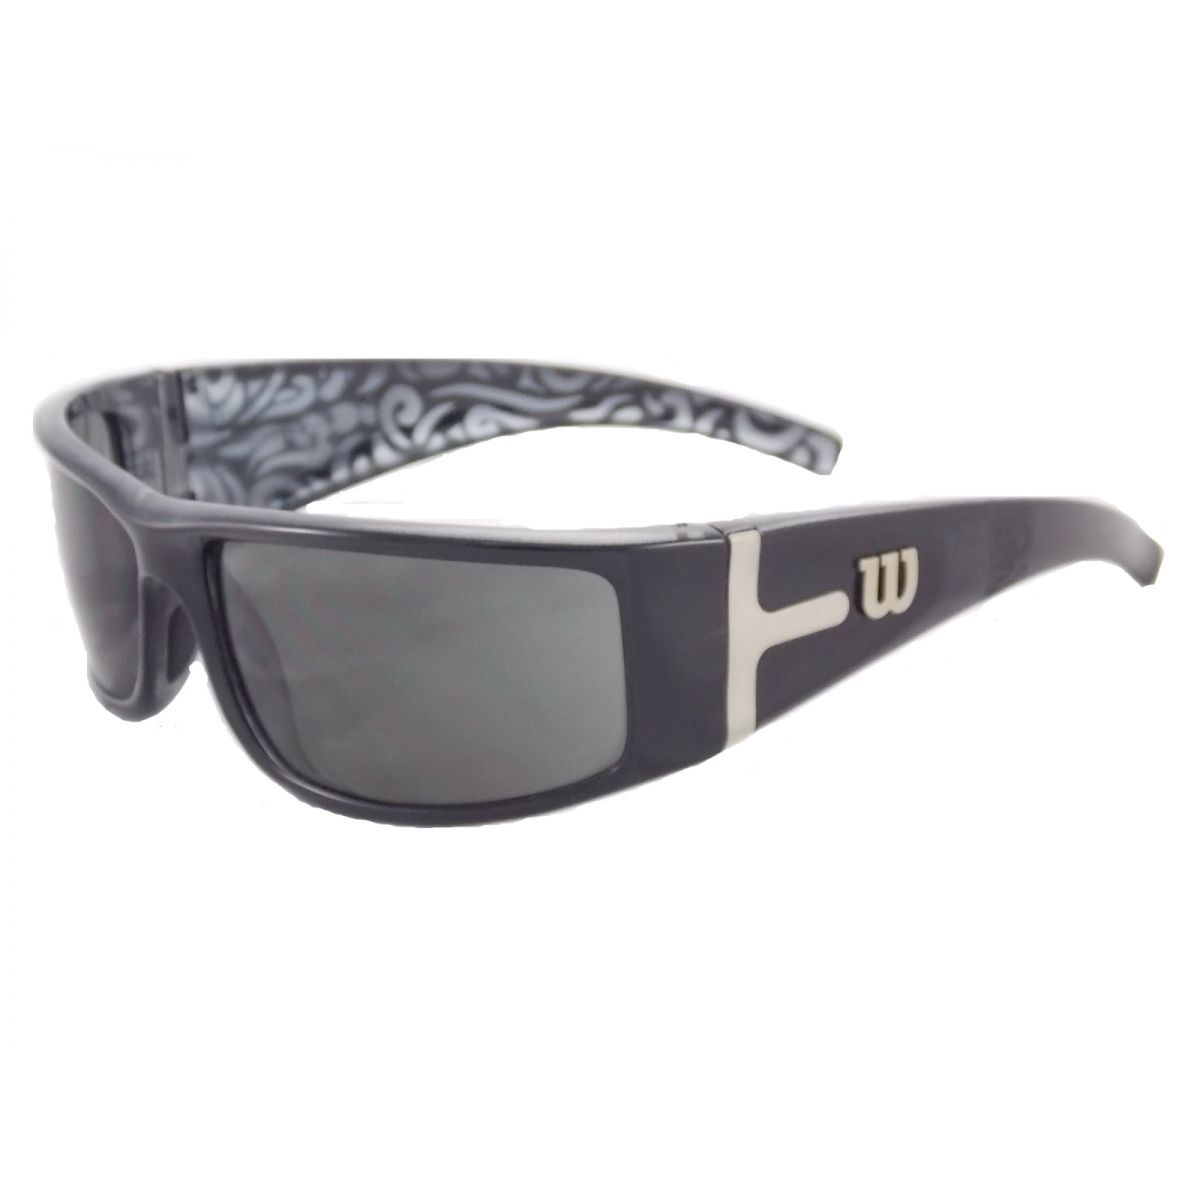 09b1237a6f431 Óculos de Sol Wilson Pan Oceanic W8093 872 01WilsonPromoçãoCompra ...